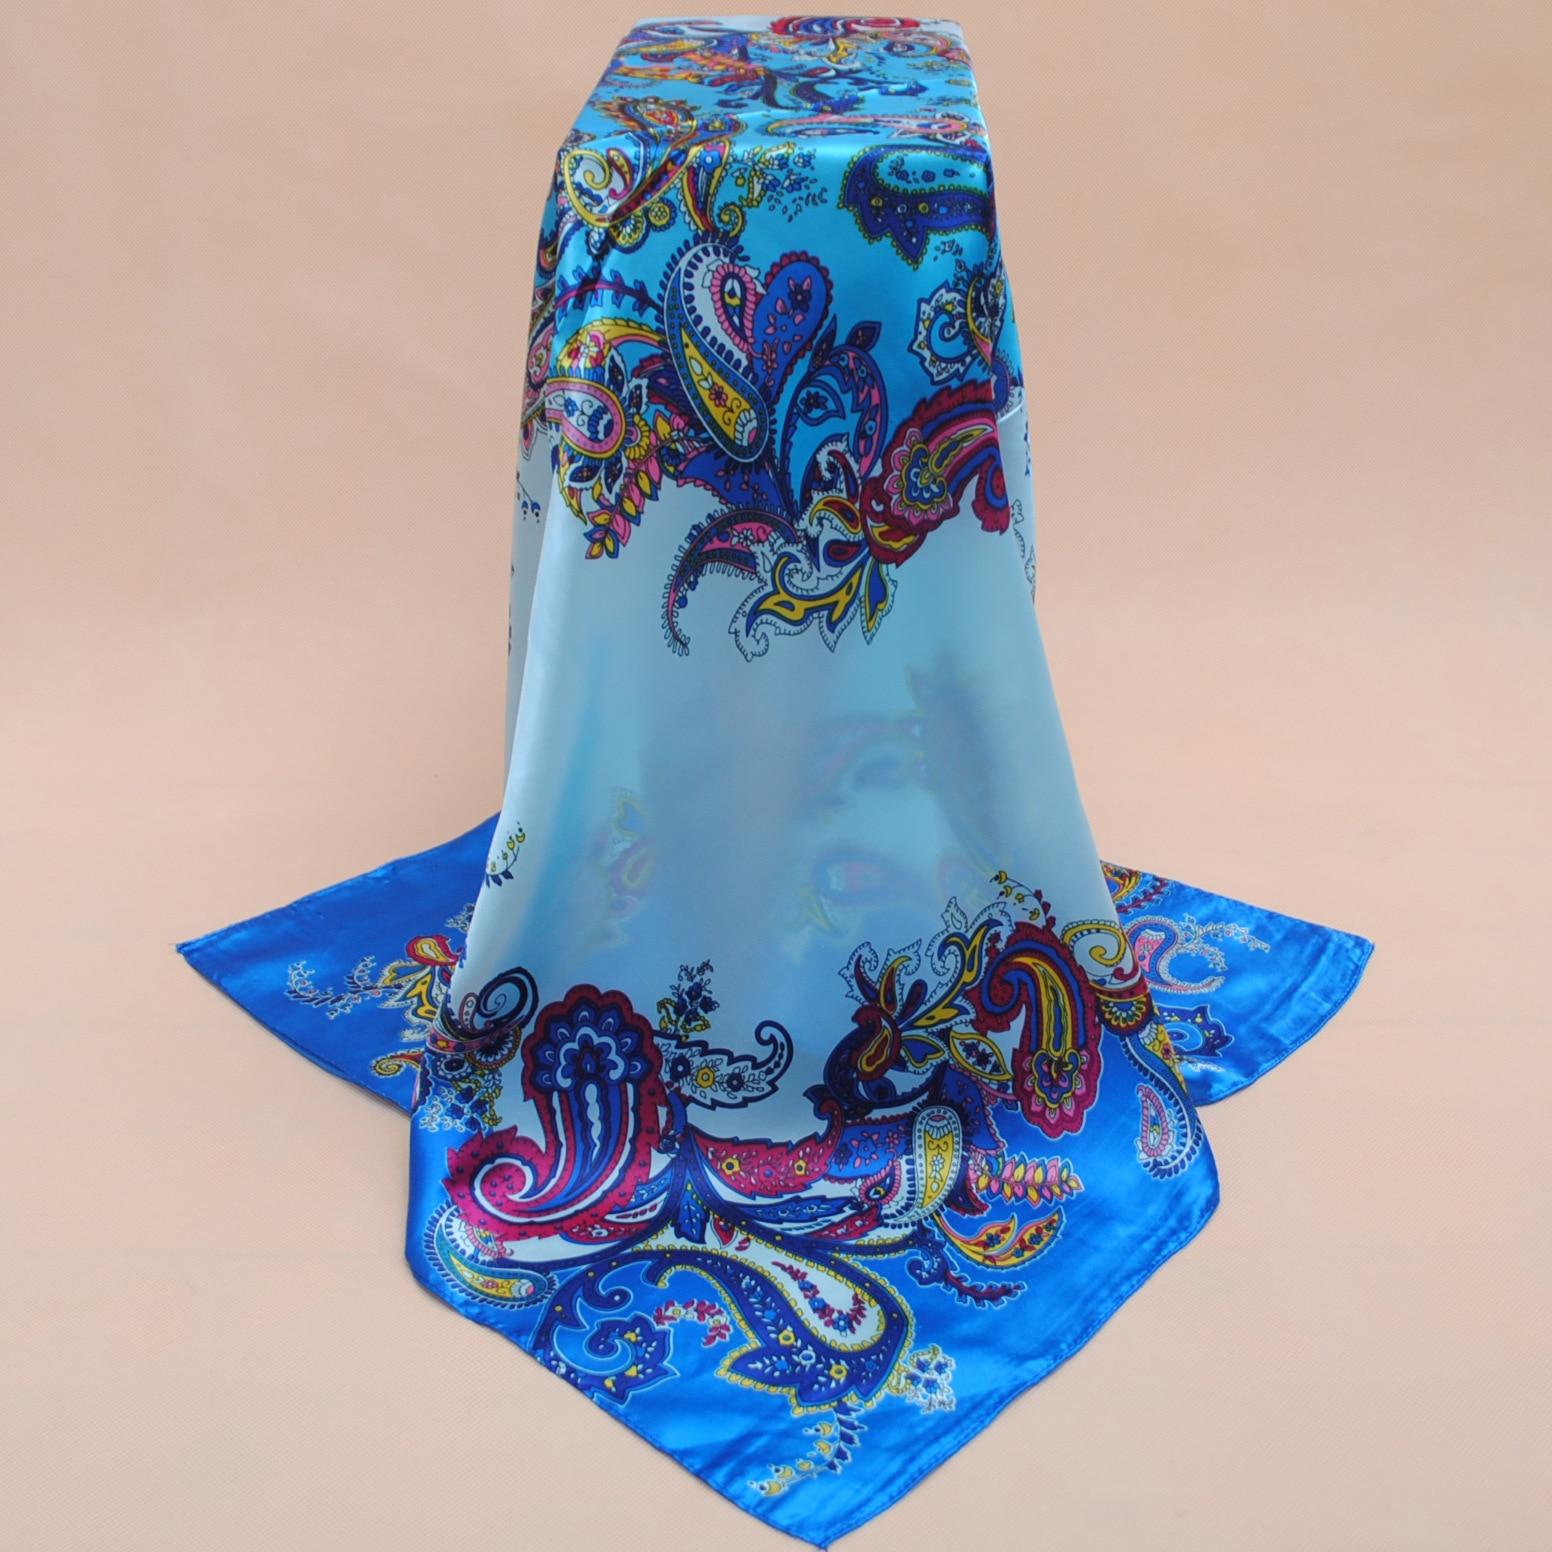 Lenco pañuelo de seda impreso rosa, 90*90cm bufanda Multicolor de satén chal para damas, pañuelo de moda Primavera pañuelos de seda